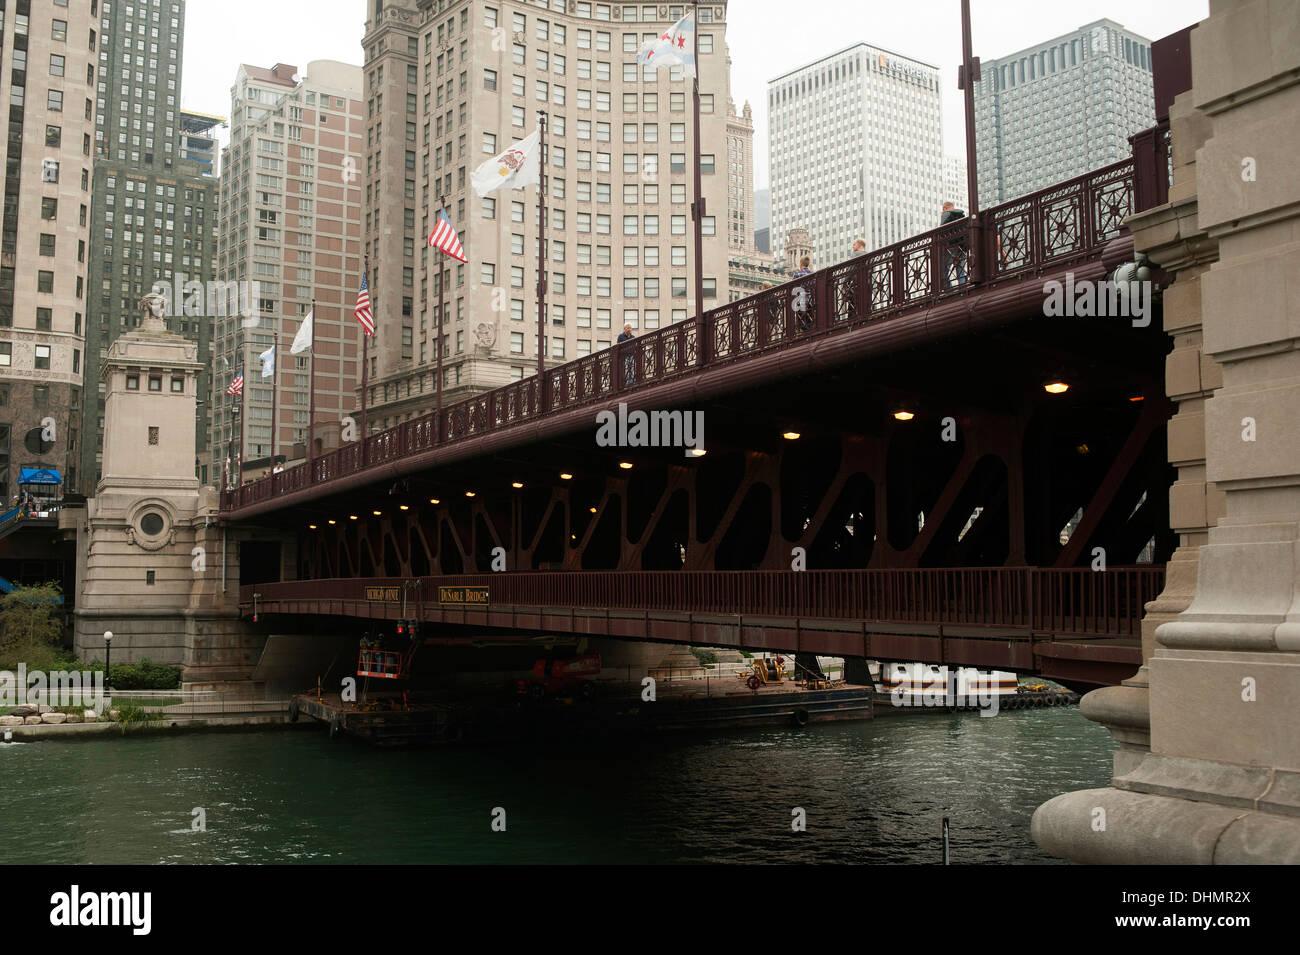 Michigan Avenue Bridge (DuSable Bridge), crosses the Chicago River, Downtown Chicago, Illinois, USA - Stock Image